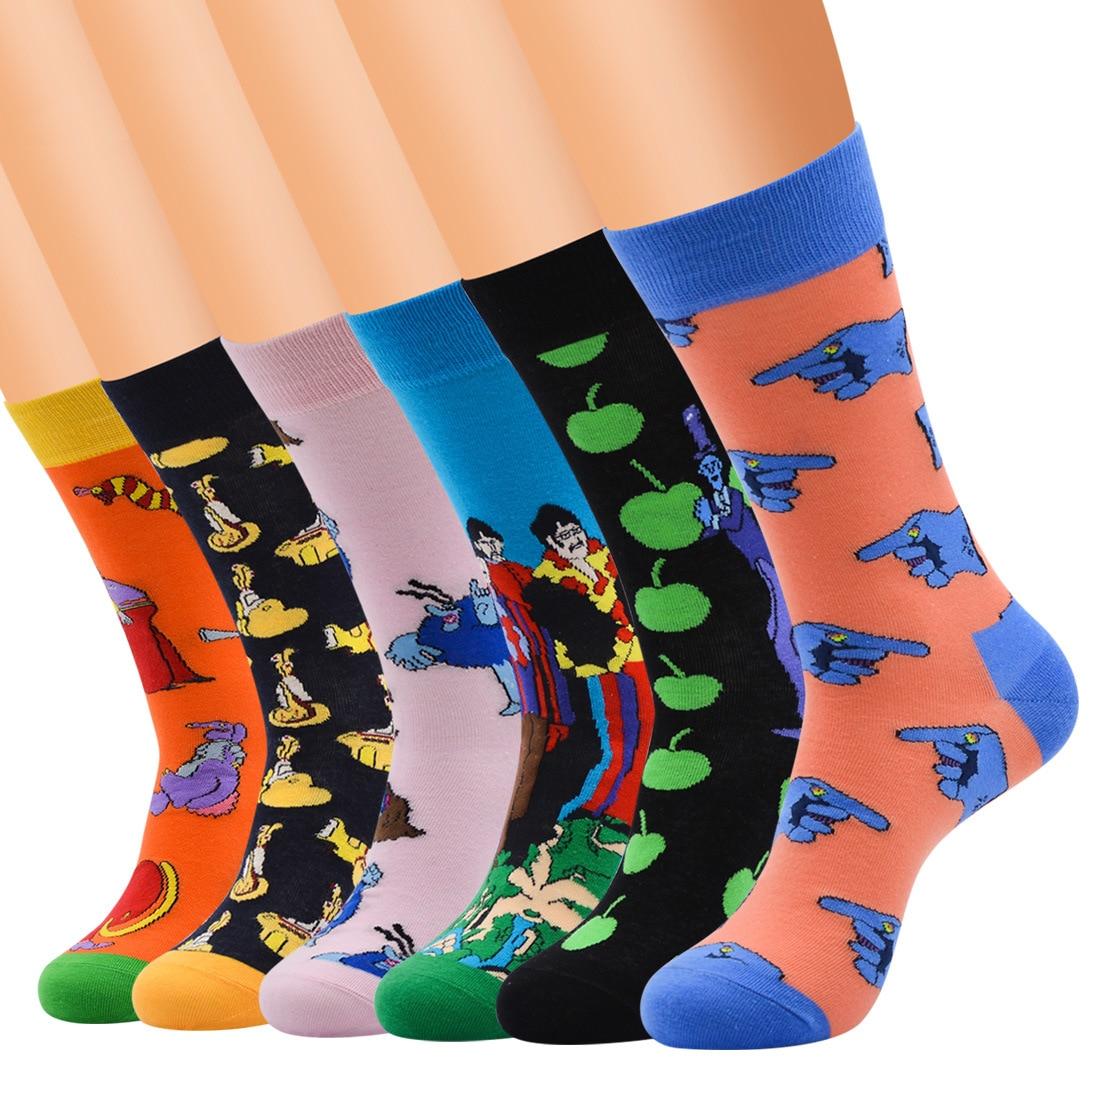 2018 New Men's Funny Colorful Combed Cotton Socks Happy Harajuku Cartoon Socks Male Casual Business Wedding Gift Socks